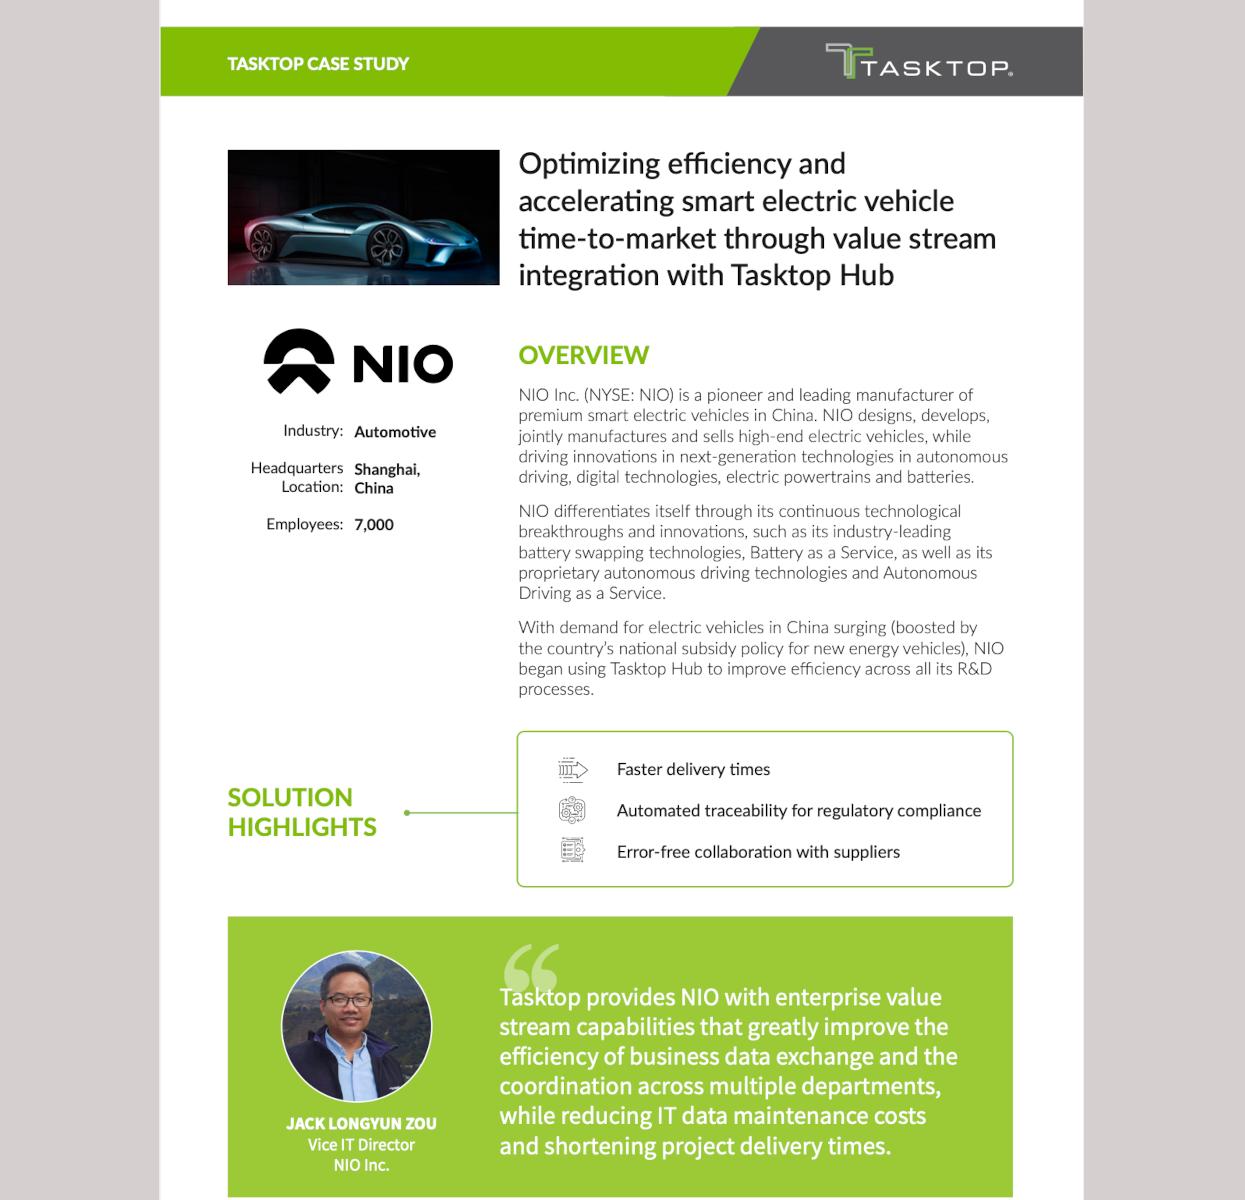 nio value stream integration case study